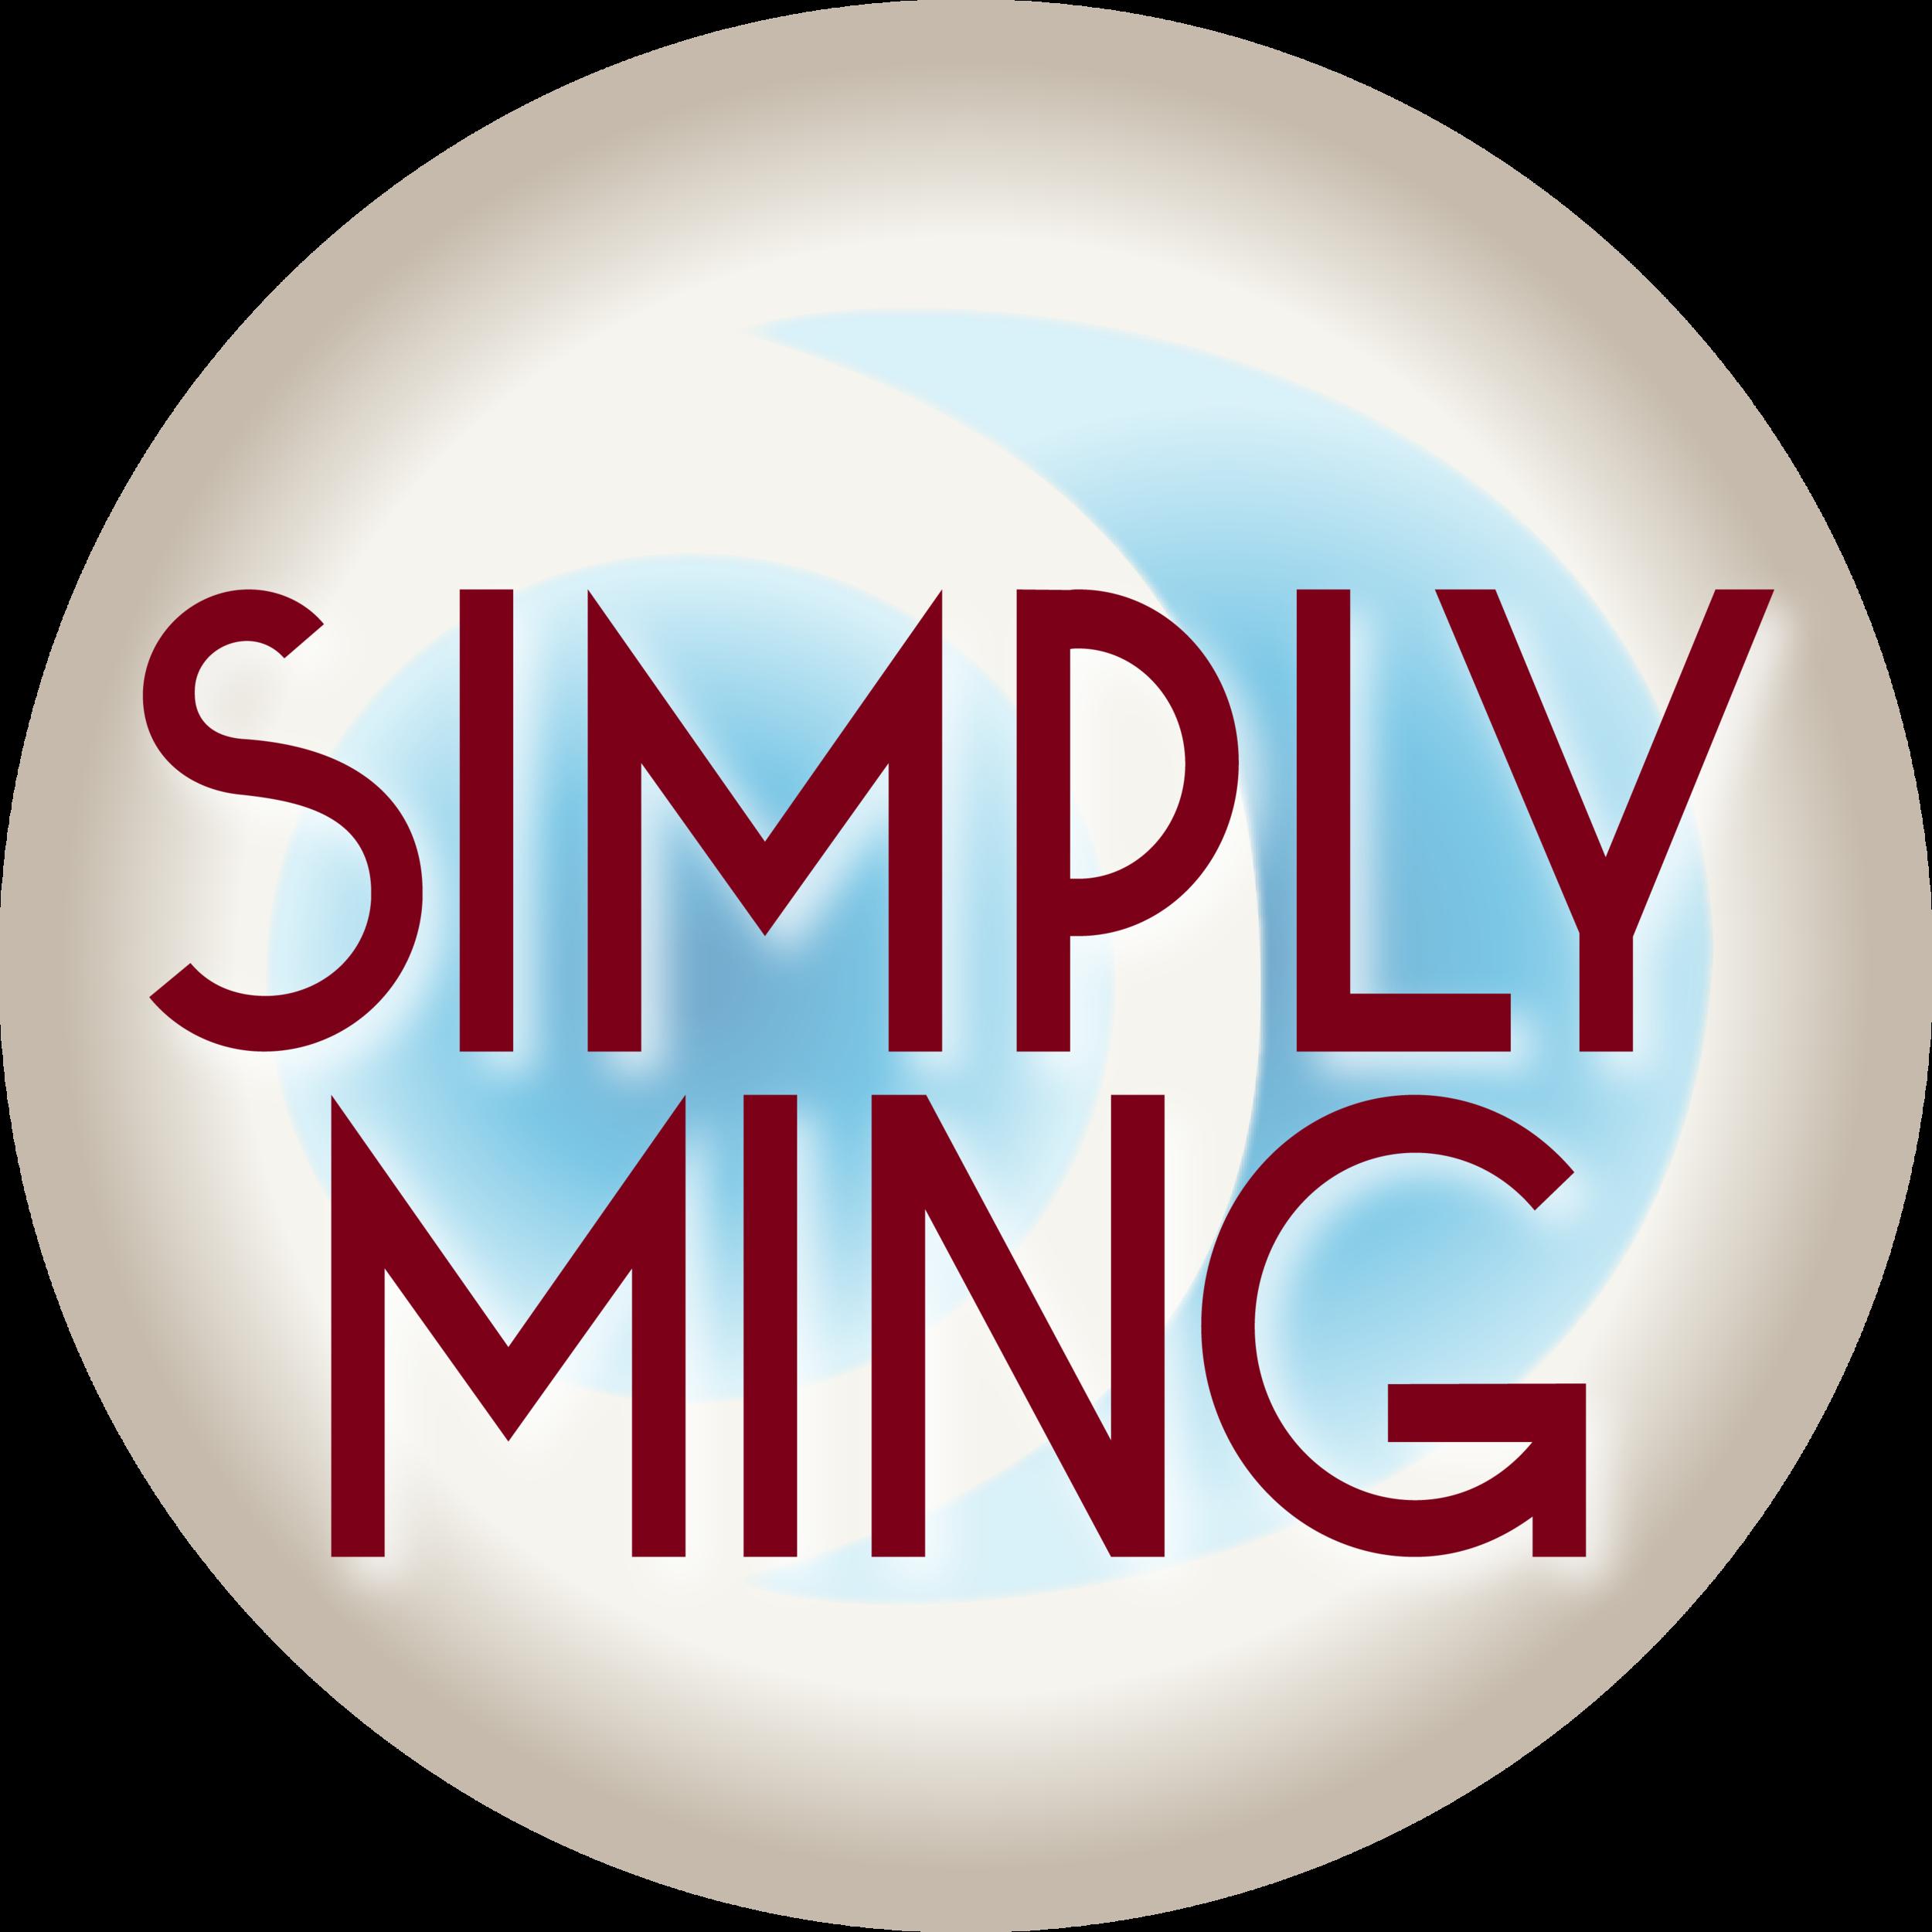 Simply Ming Logo 2014.png